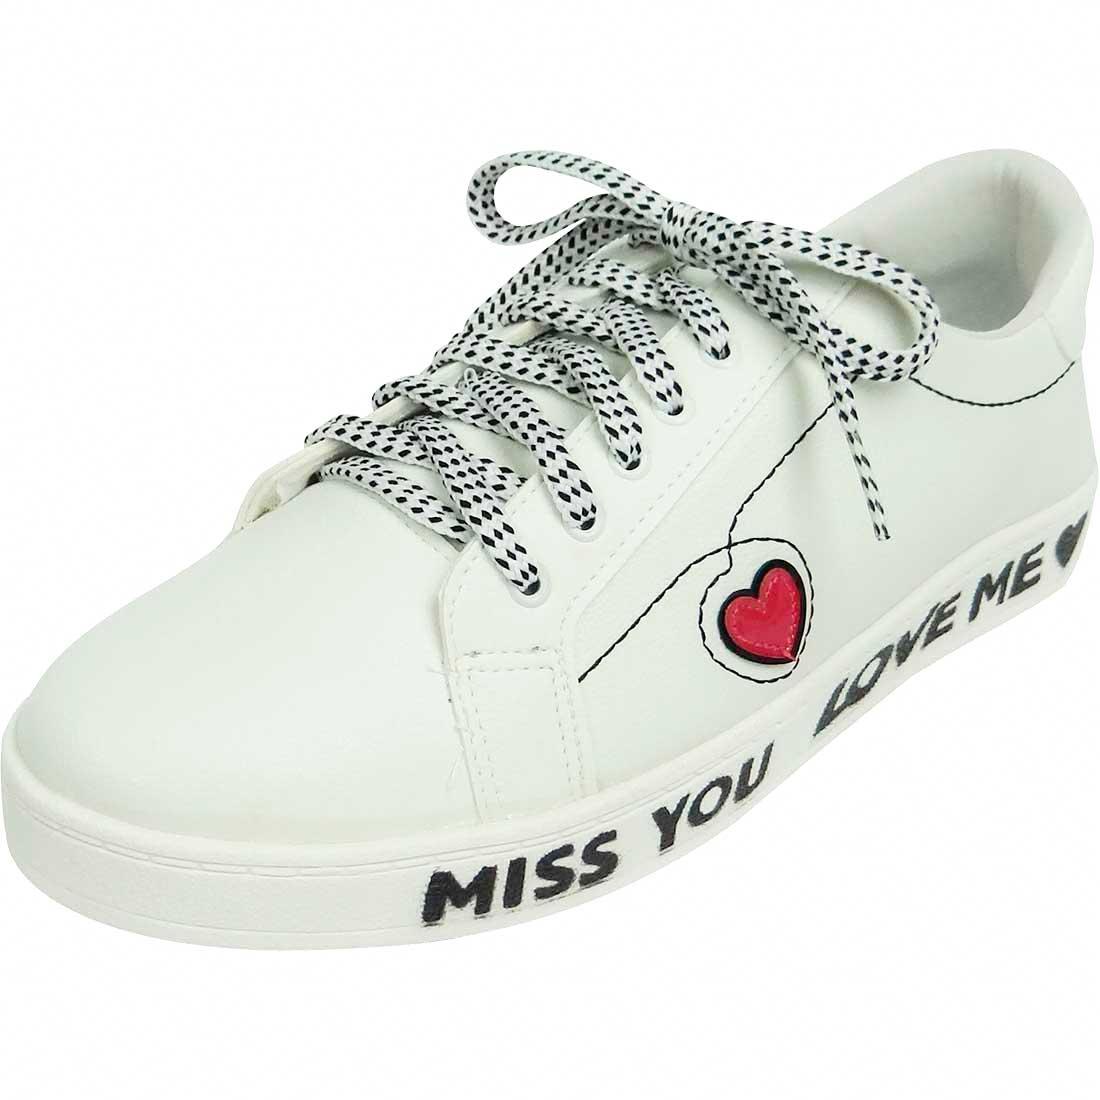 Tênis Miss You Love Me - Branco